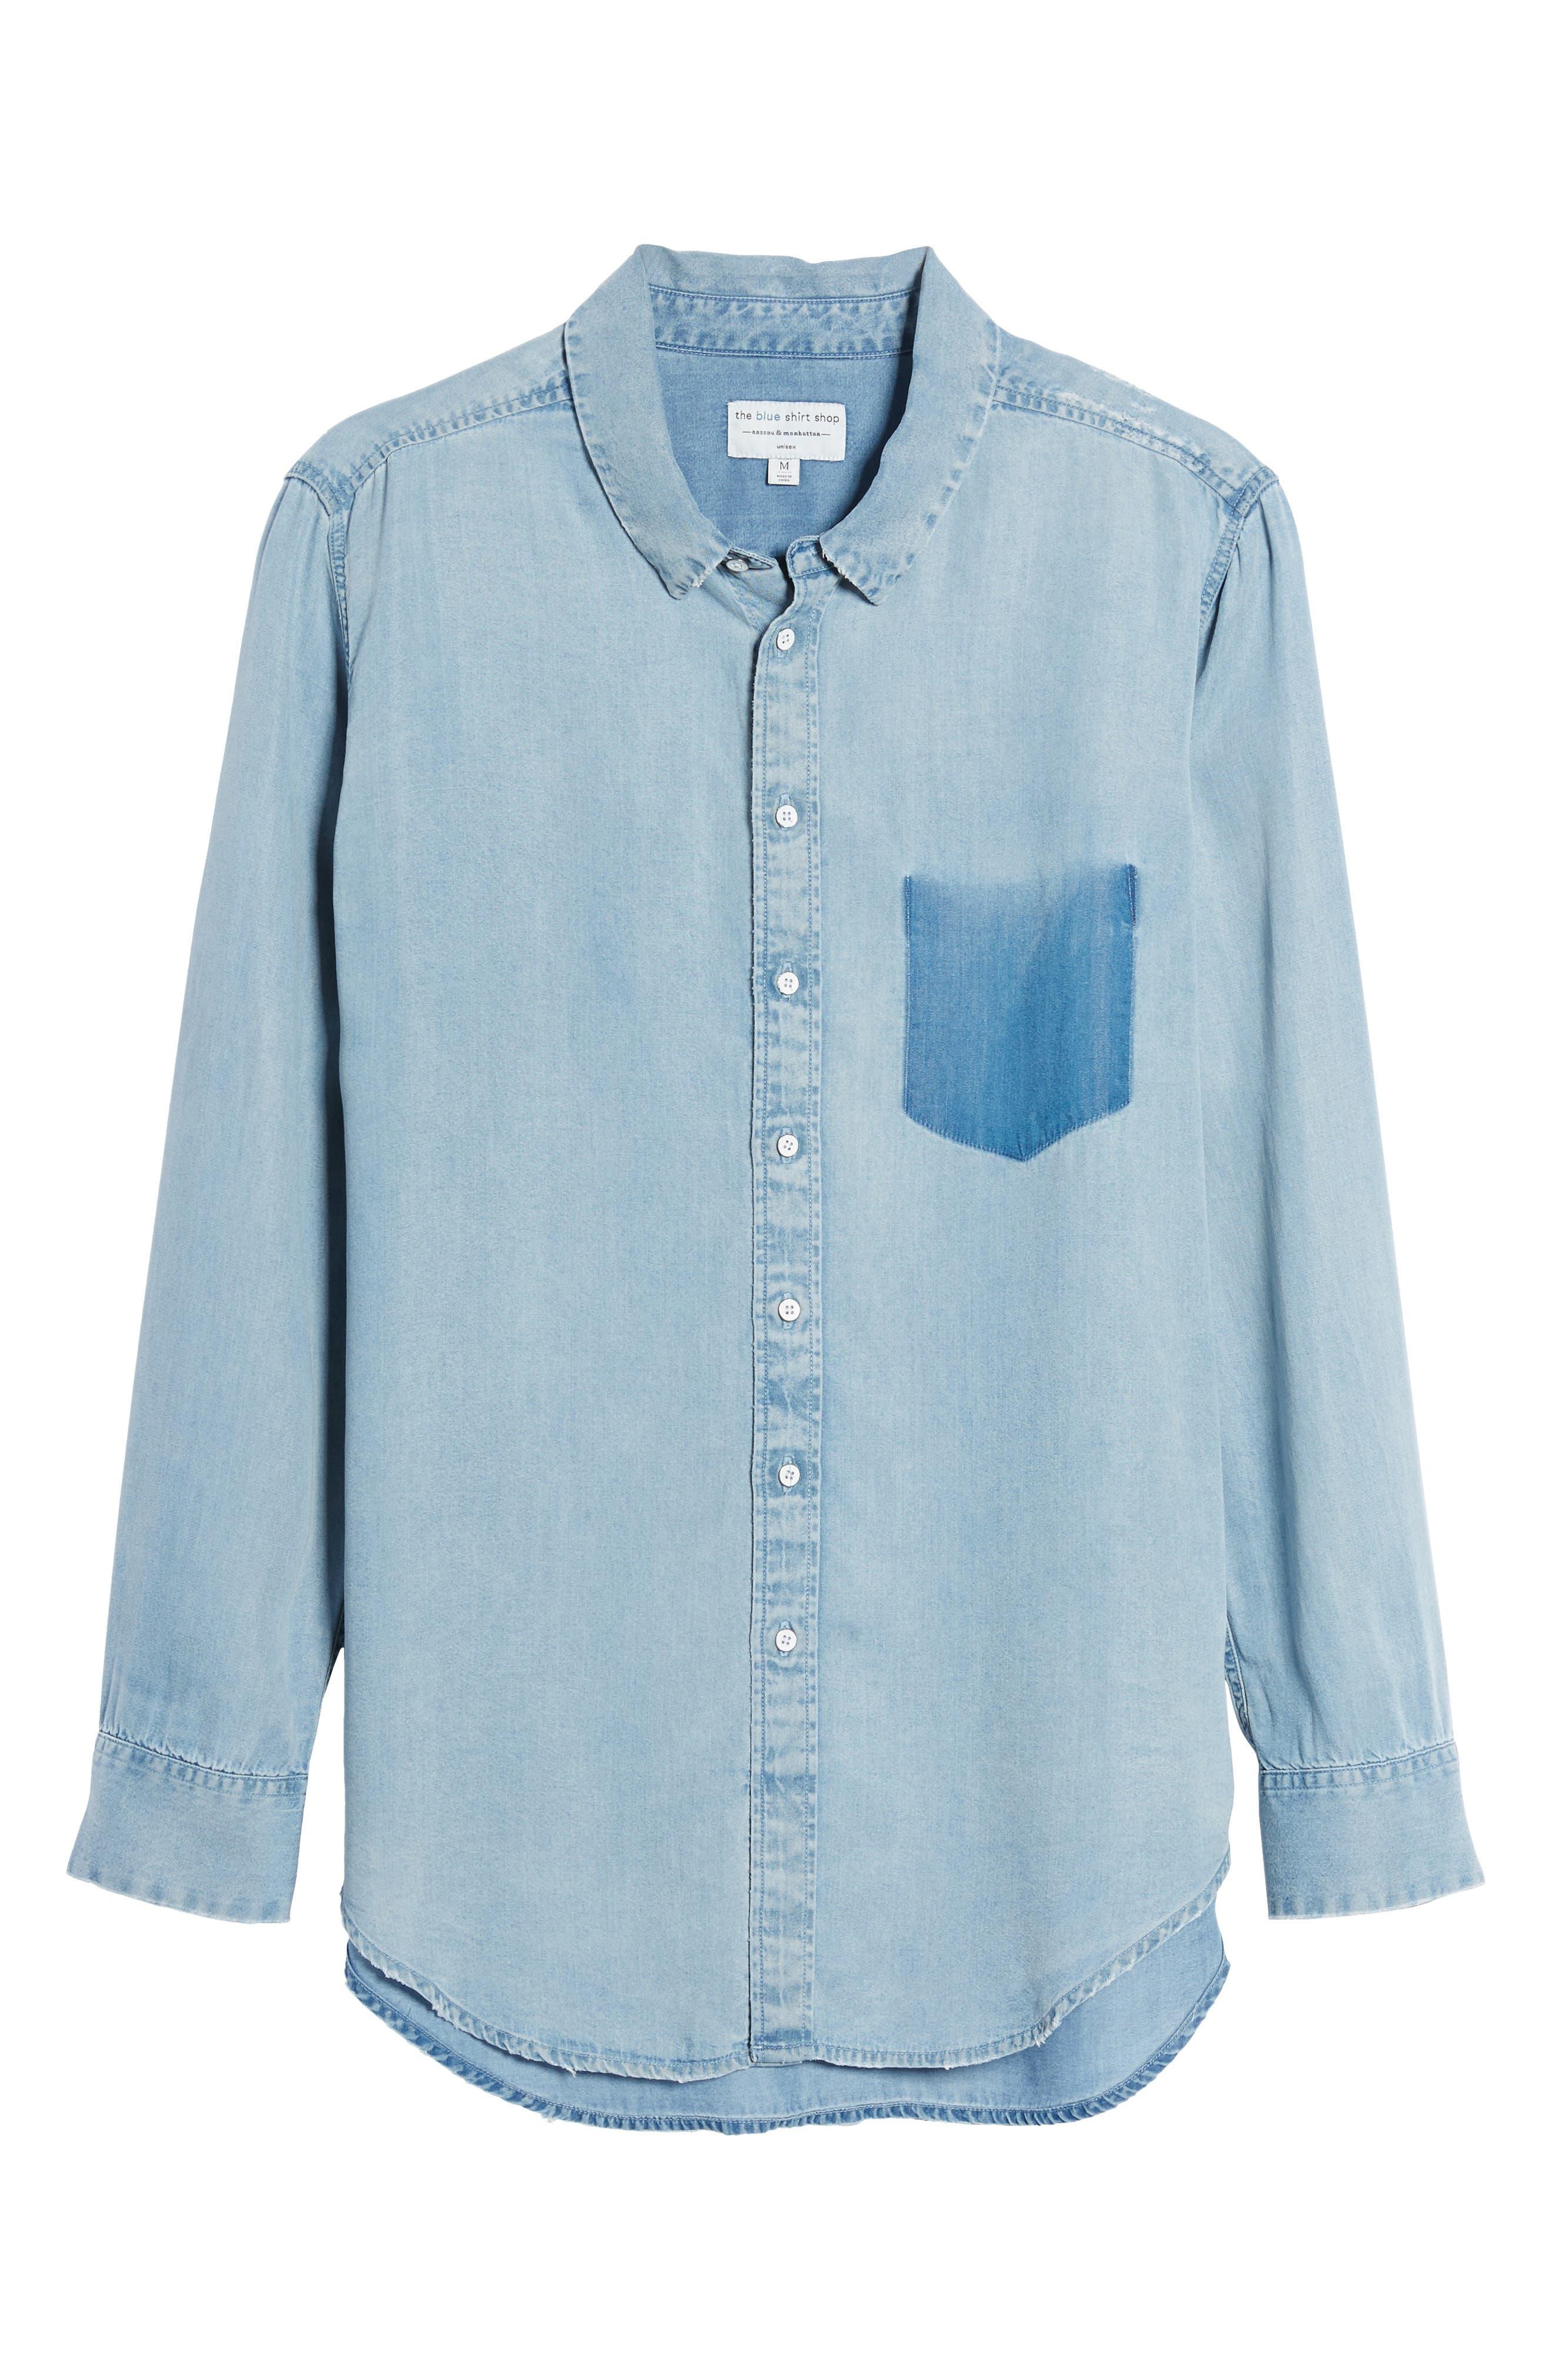 x The Blue Shirt Shop Nassau & Manhattan Boyfriend Shirt,                             Alternate thumbnail 6, color,